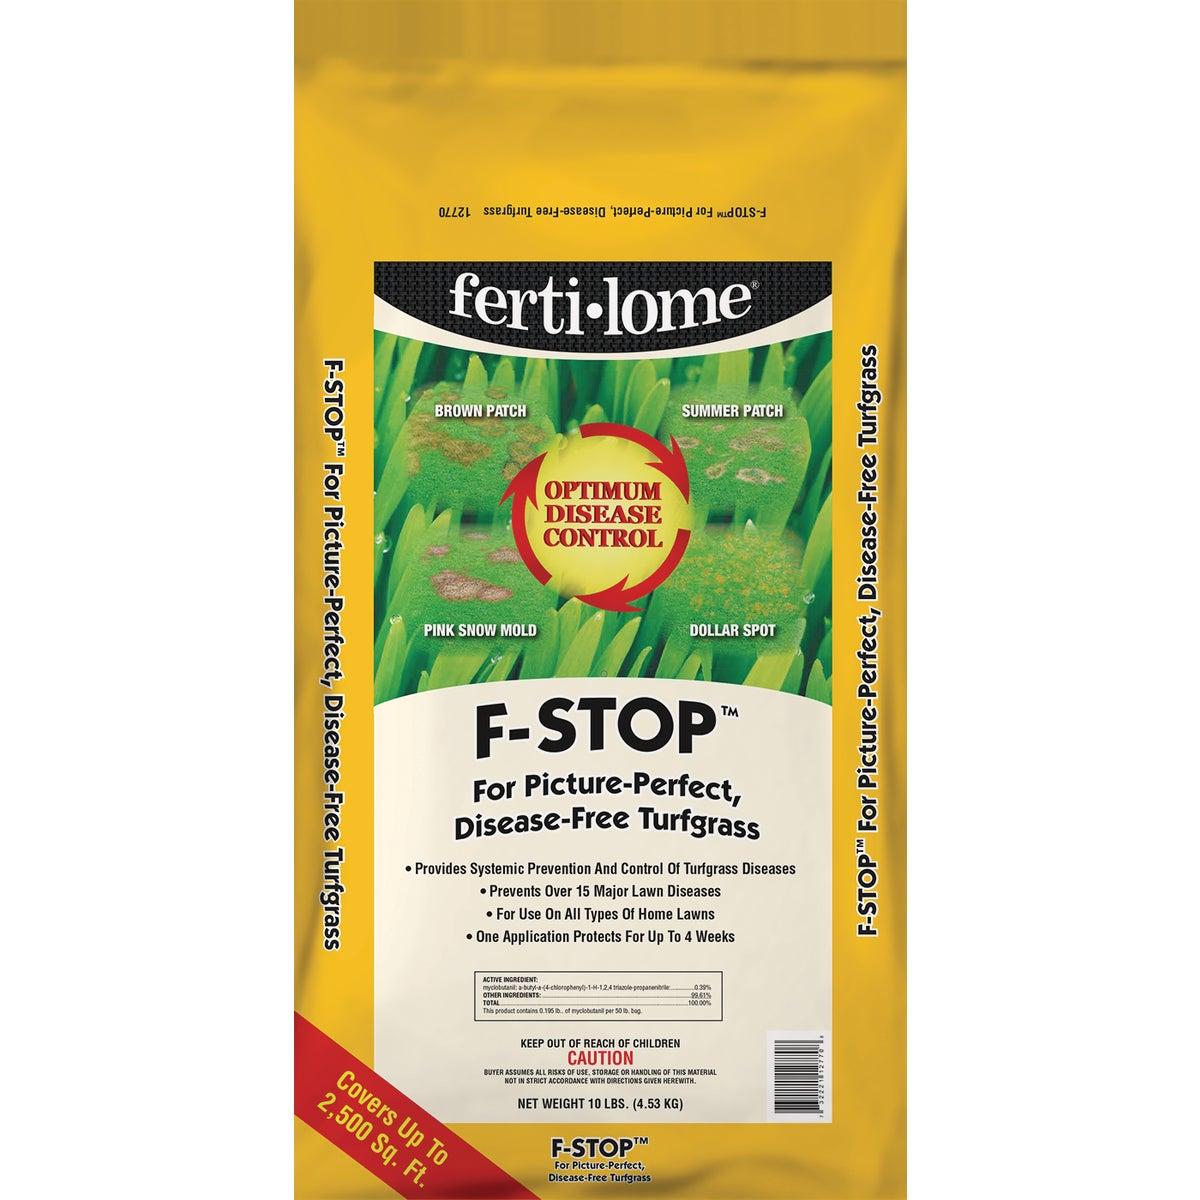 8LB F-STOP FUNGICIDE - 10770 by Vpg Fertilome